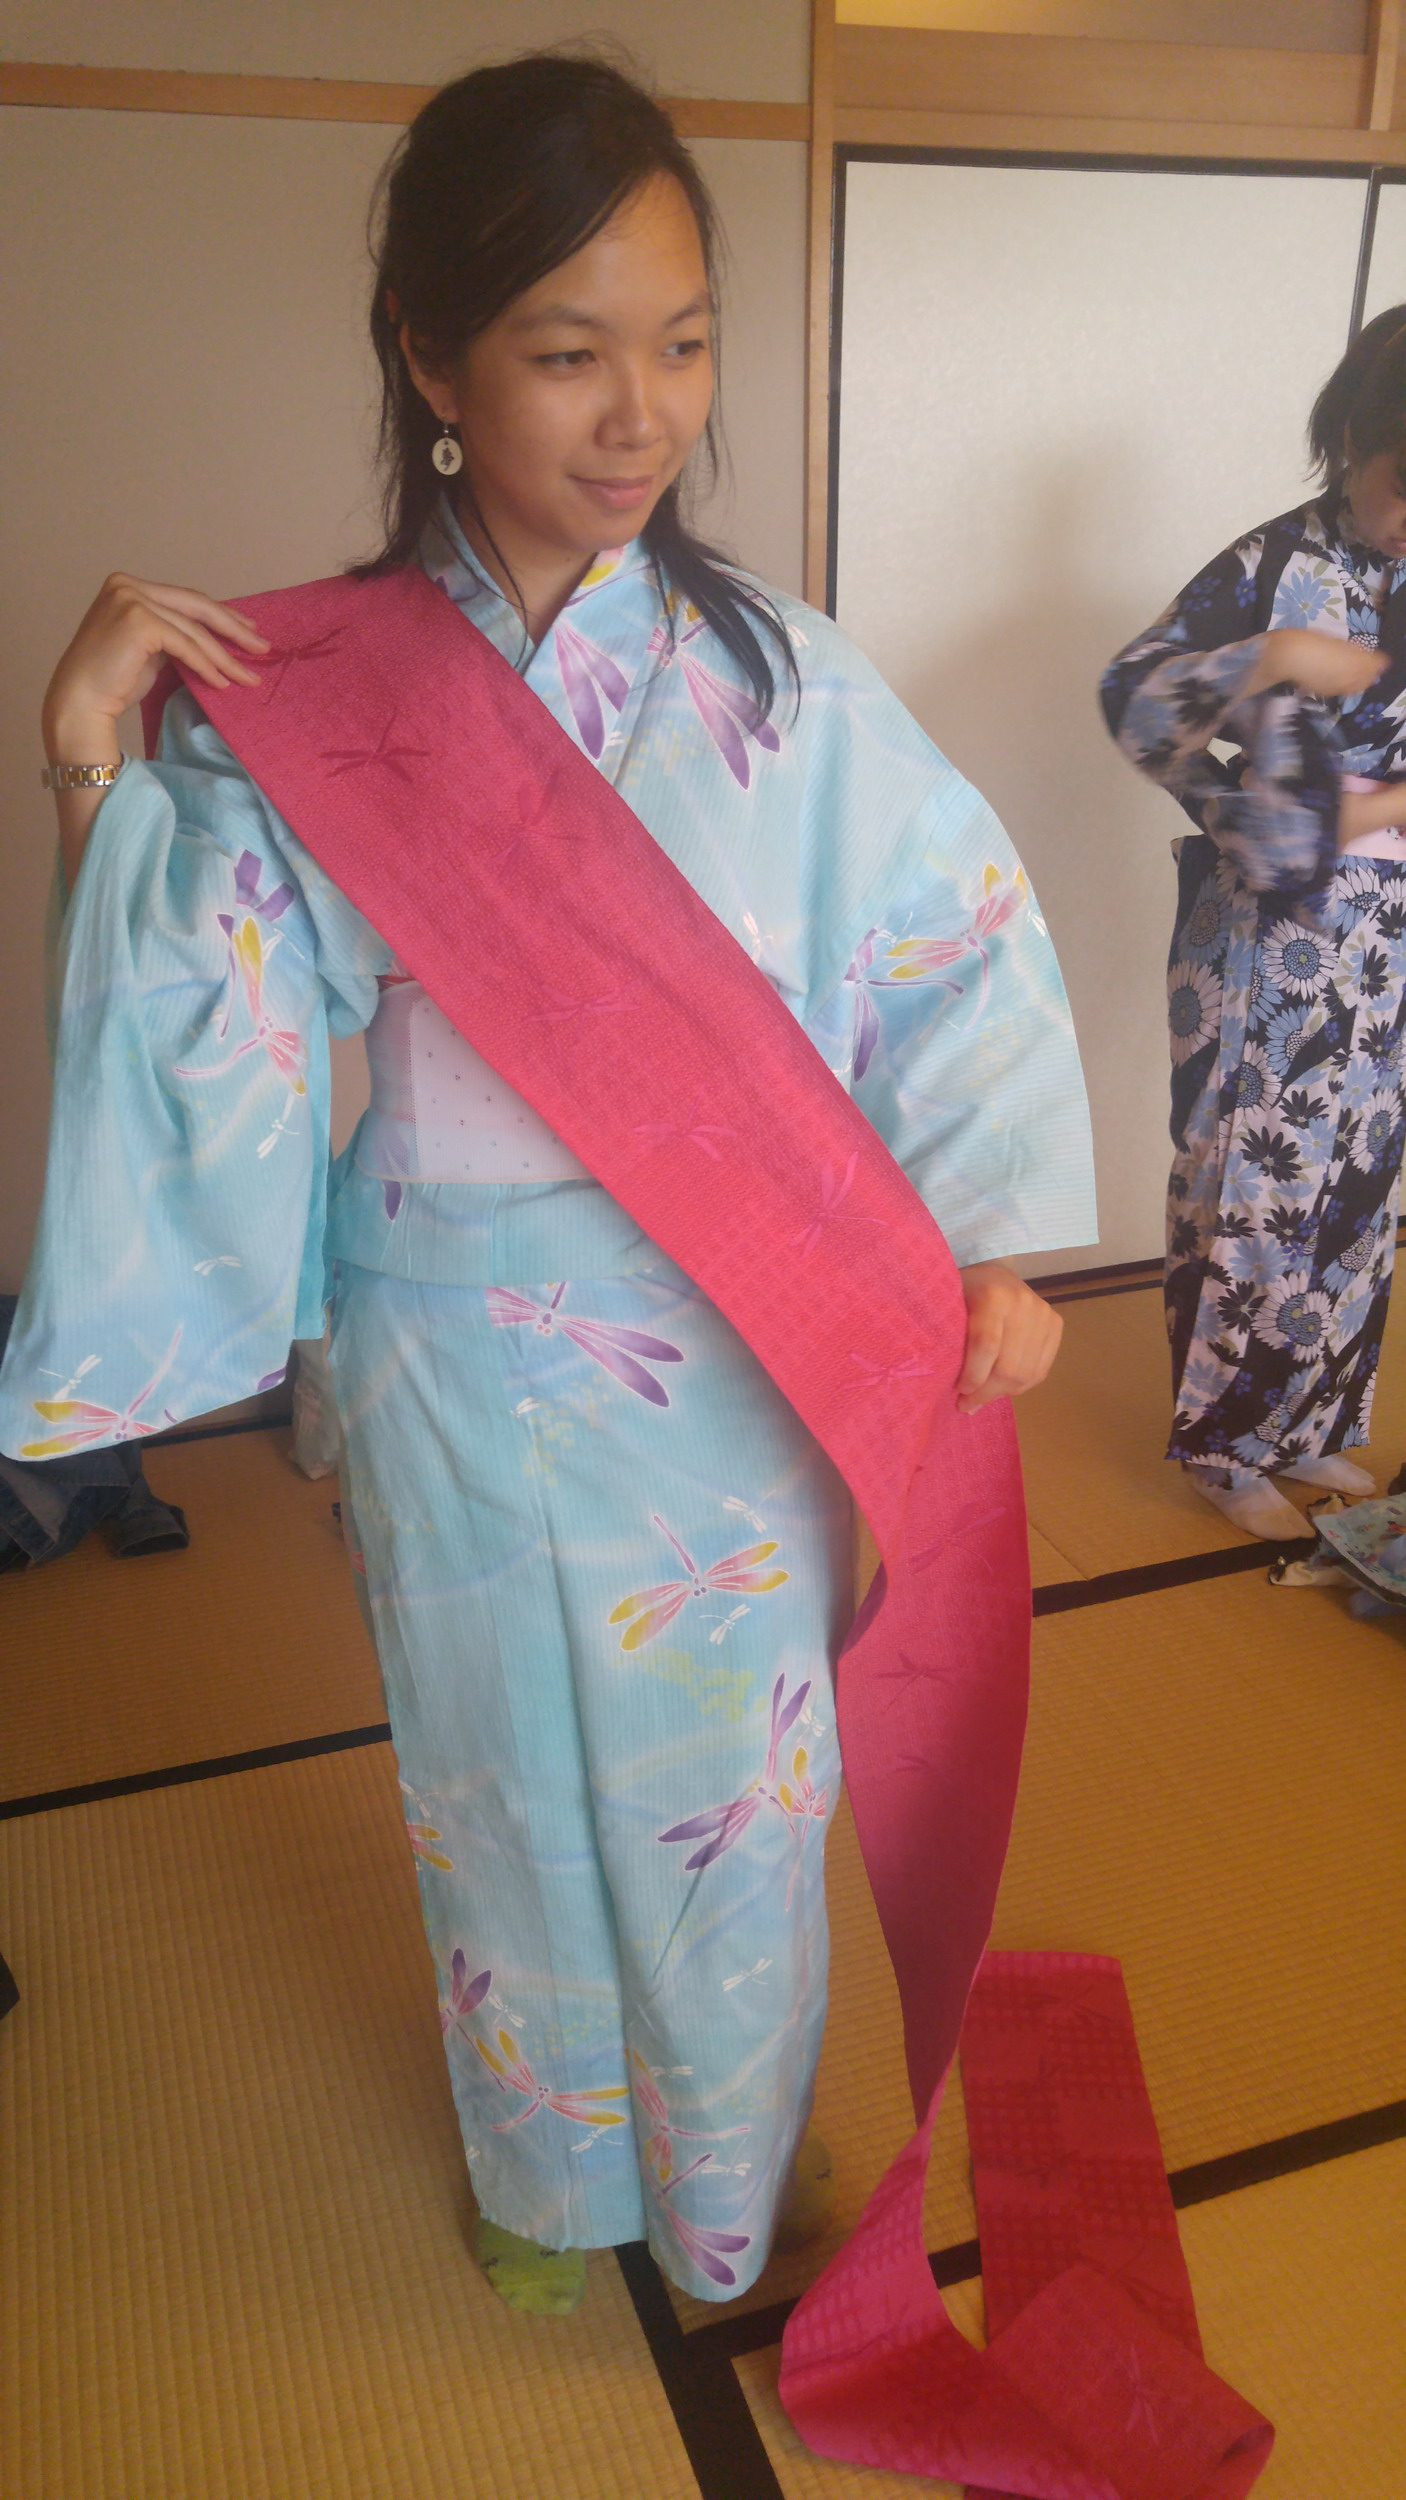 Tea ceremony: trying on yukata